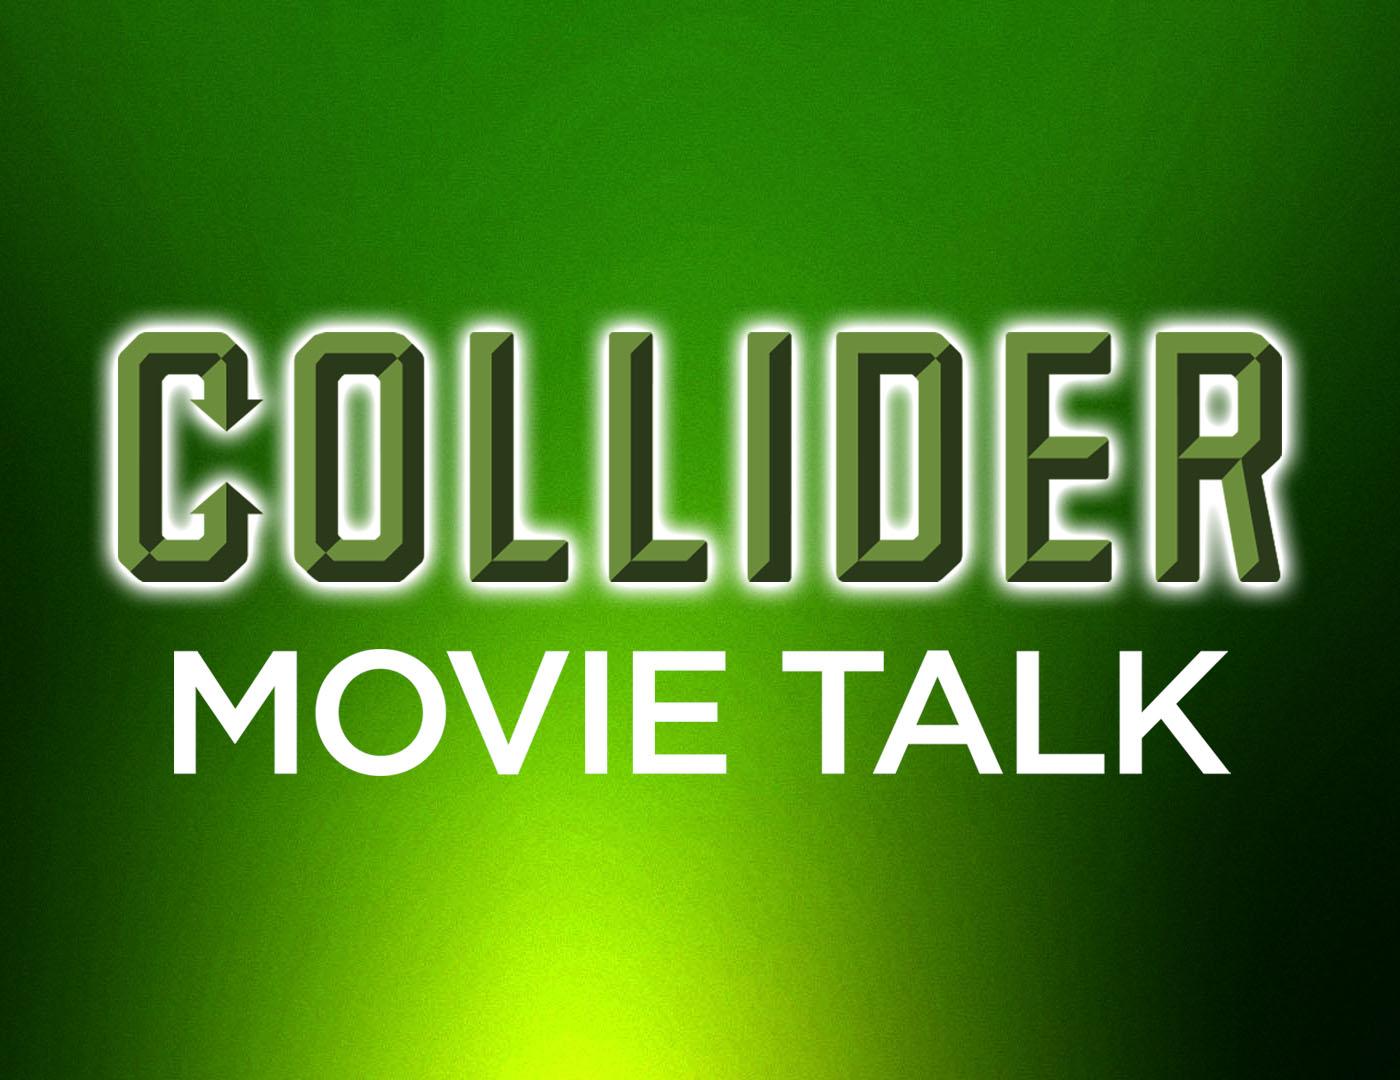 Comic Writer Reveals Wonder Woman as Bi-Sexual - Collider Movie Talk